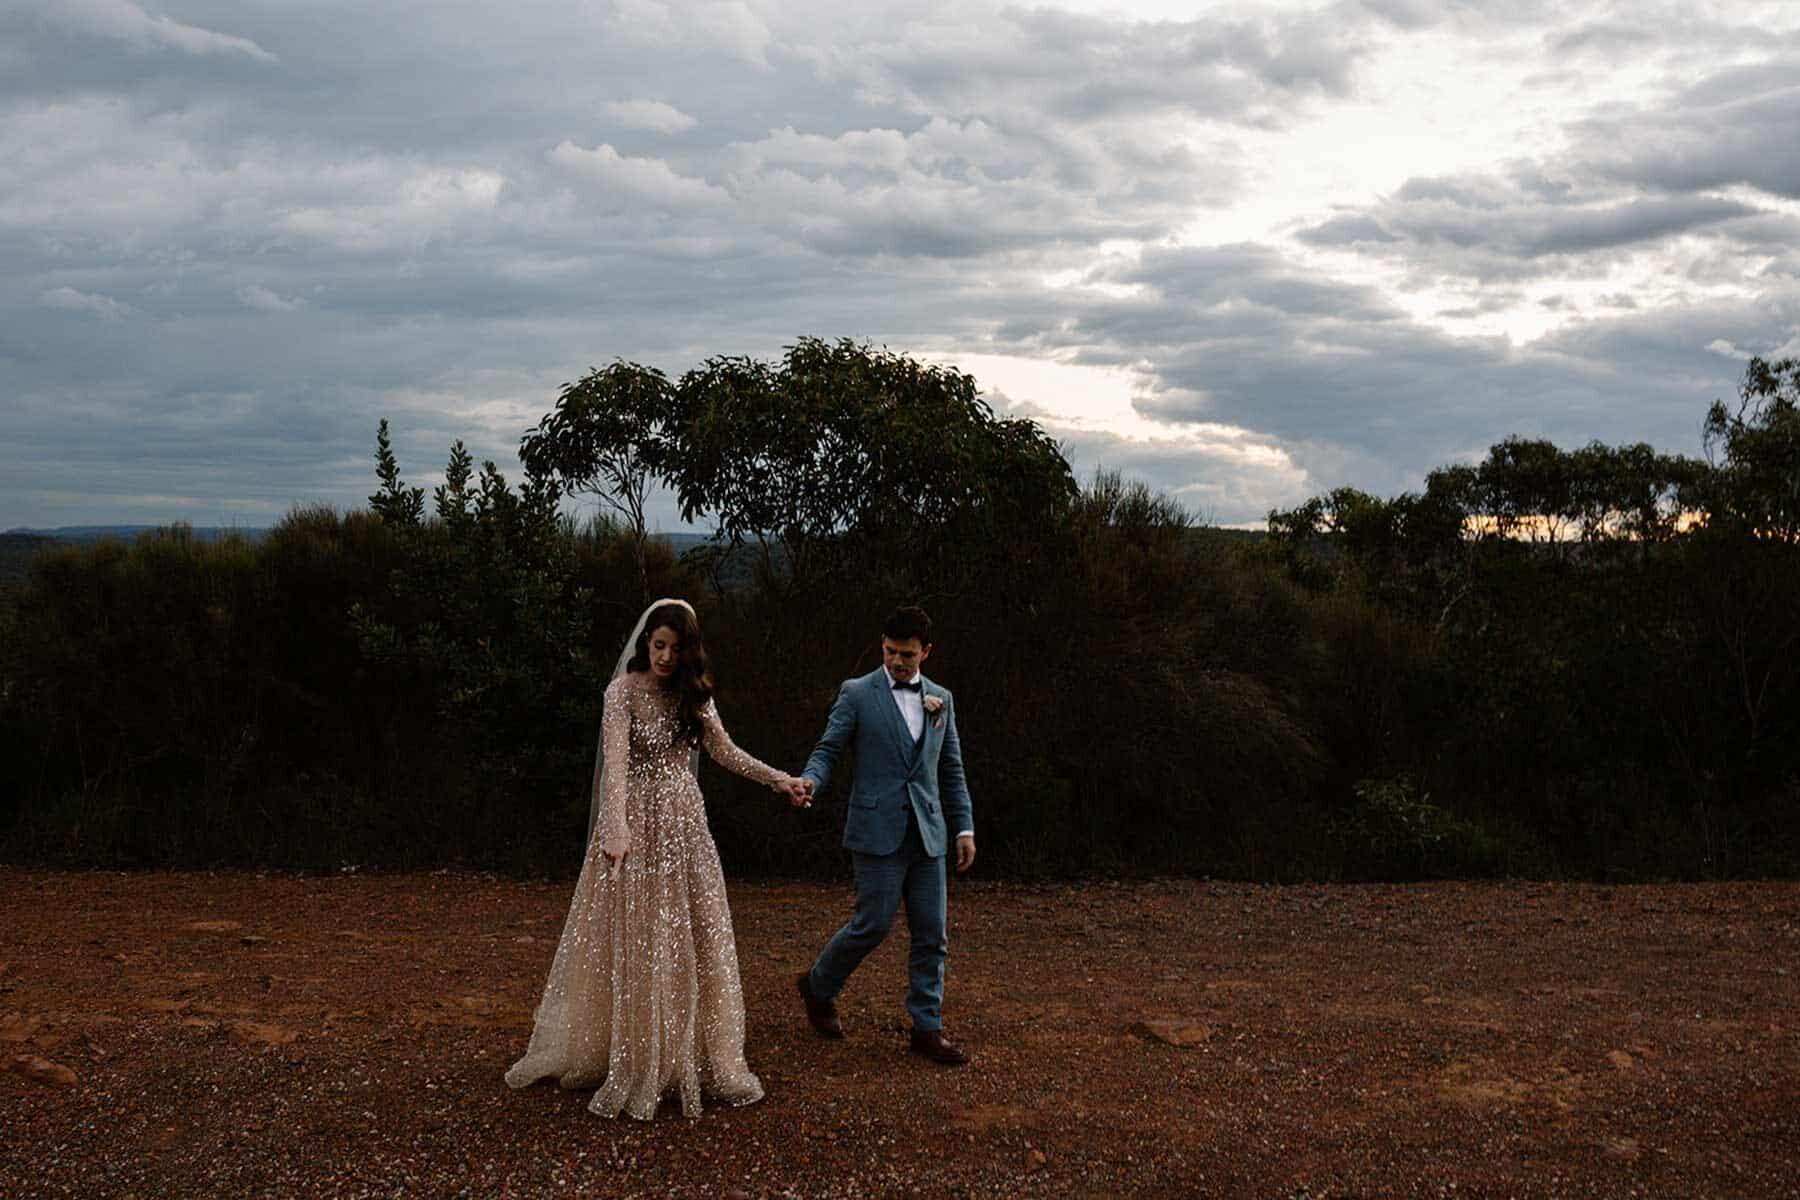 moody Sydney wedding photographer Matt Godkin